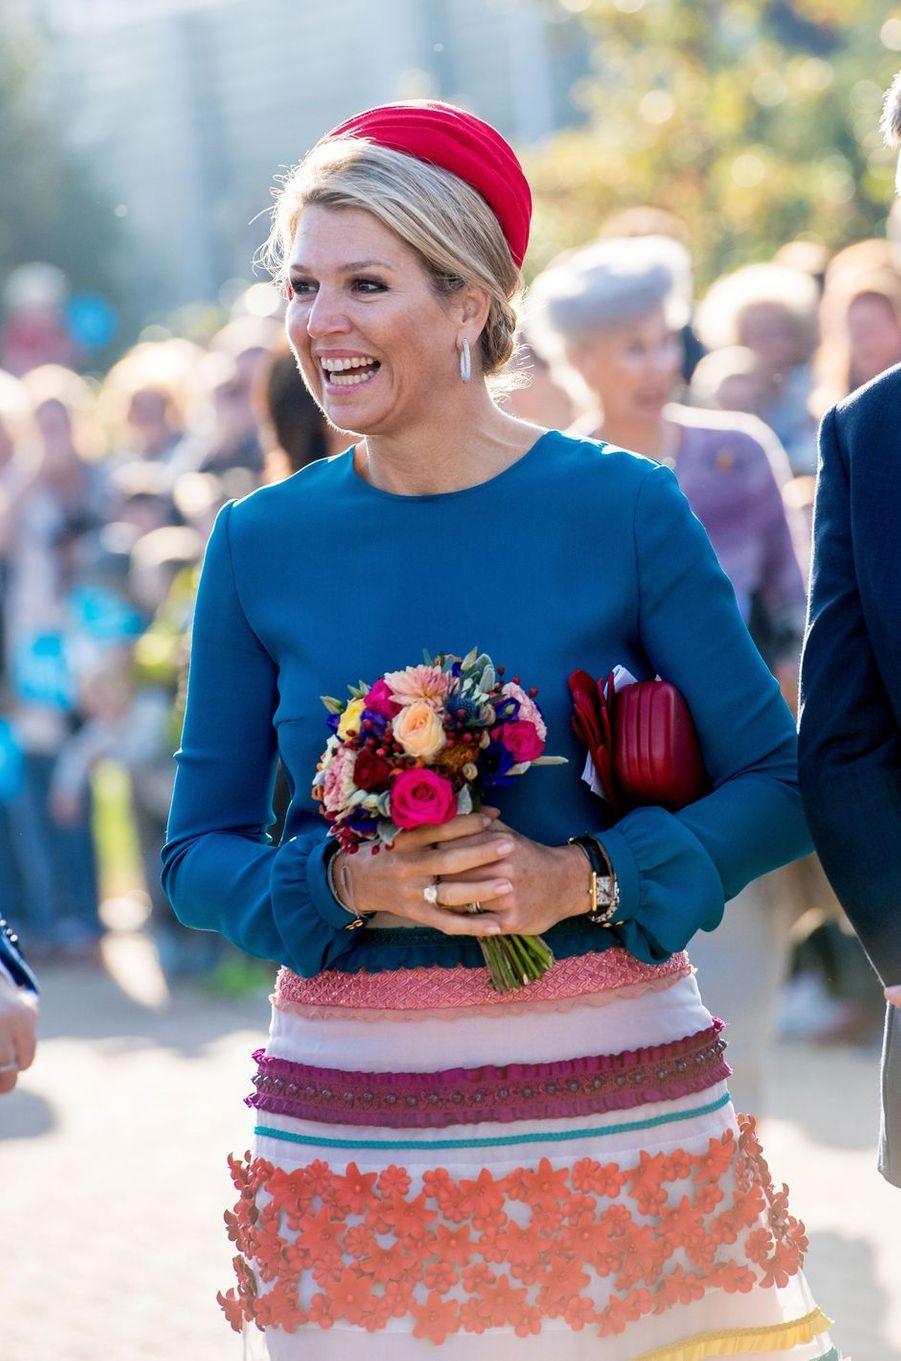 La reine Maxima des Pays-Bas en Zélande, le 16 octobre 2018